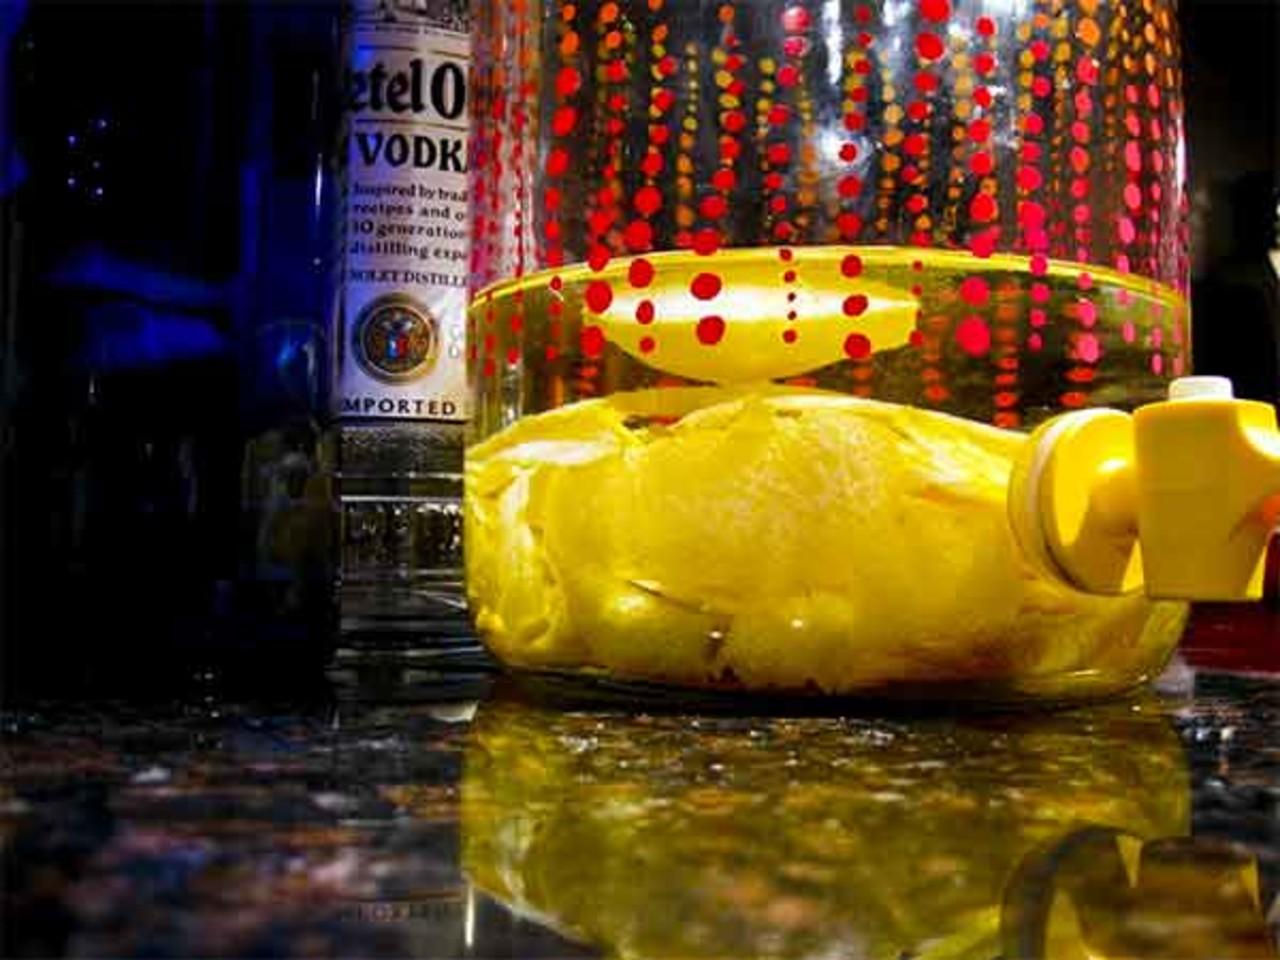 Eple infusert vodka